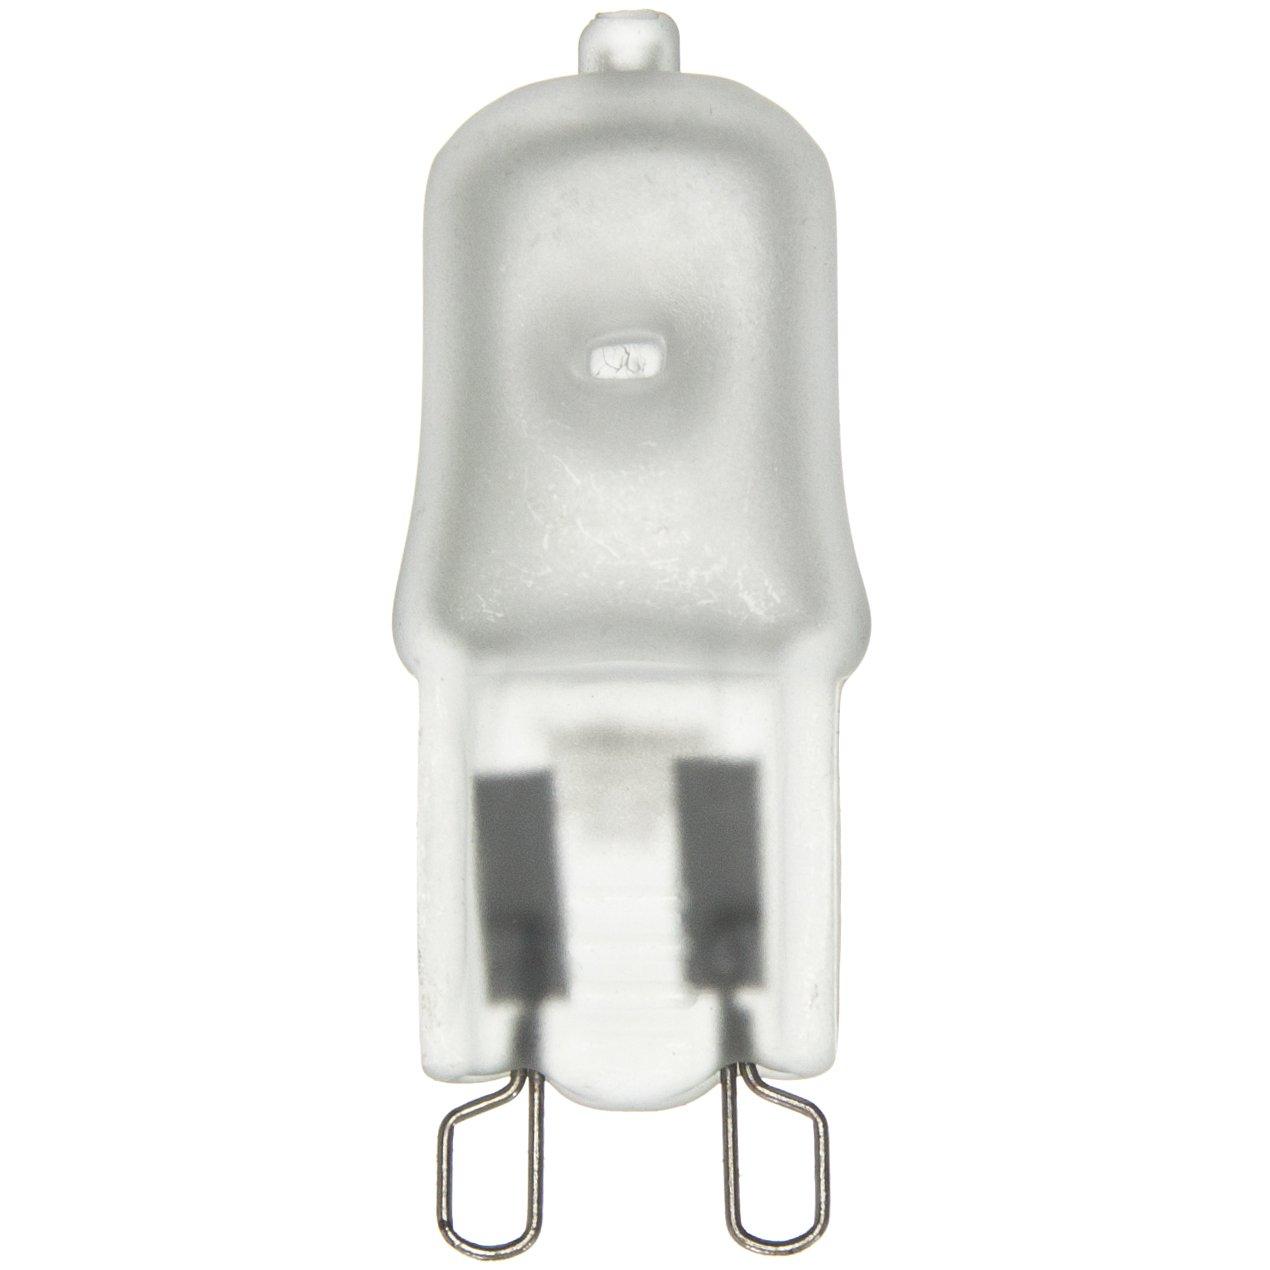 Sunlite Q50/G9/FR/120V 50-Watt Halogen G9 Bi-Pin Based Bulb, Frost - - Amazon.com